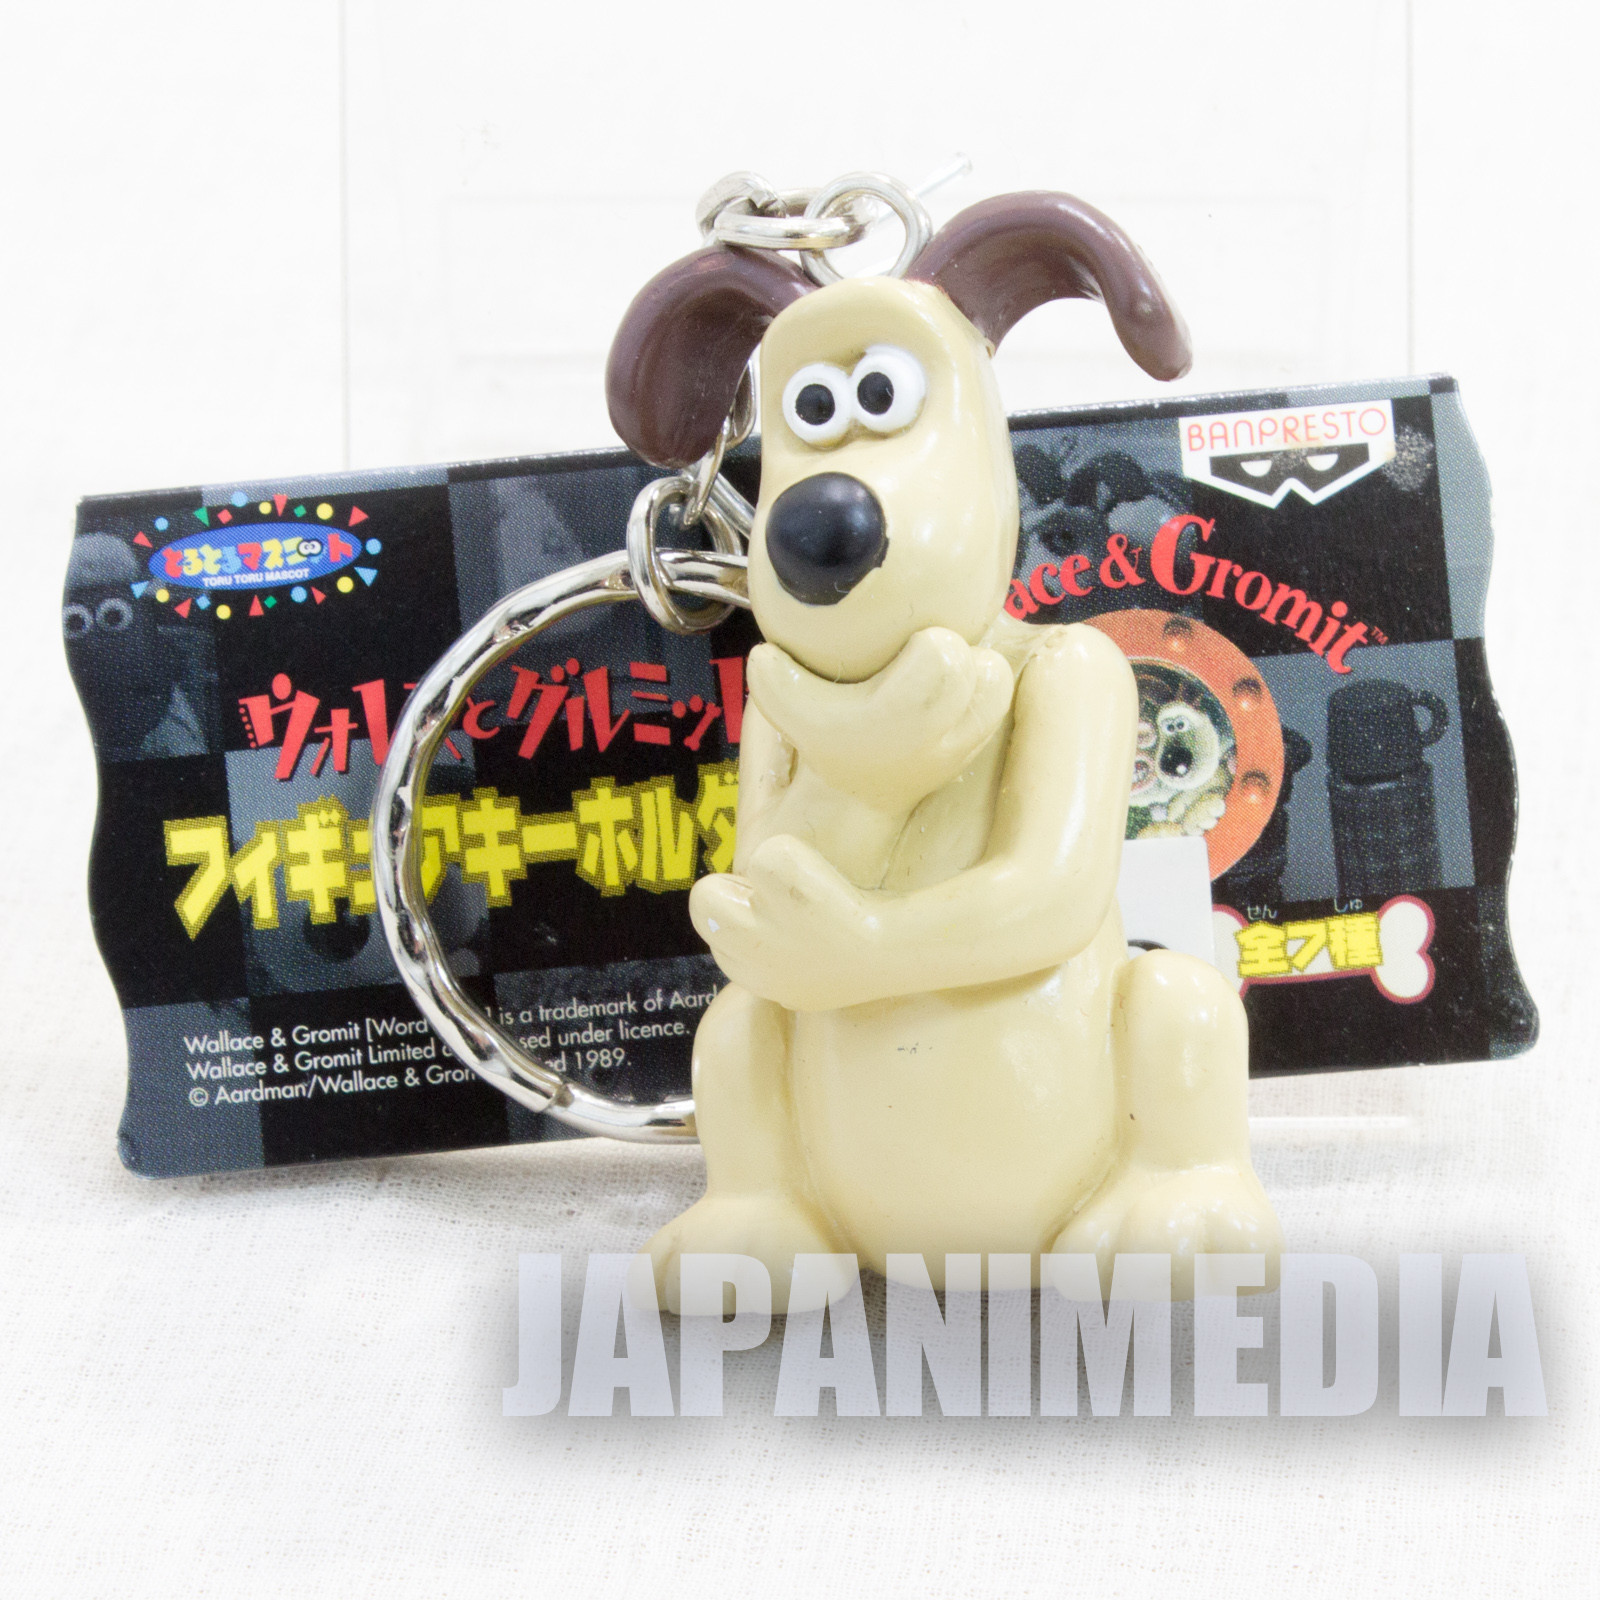 Wallace & Gromit Thinking Gromit Figure Key Chain 2 Banpresto JAPAN Ardman ANIME